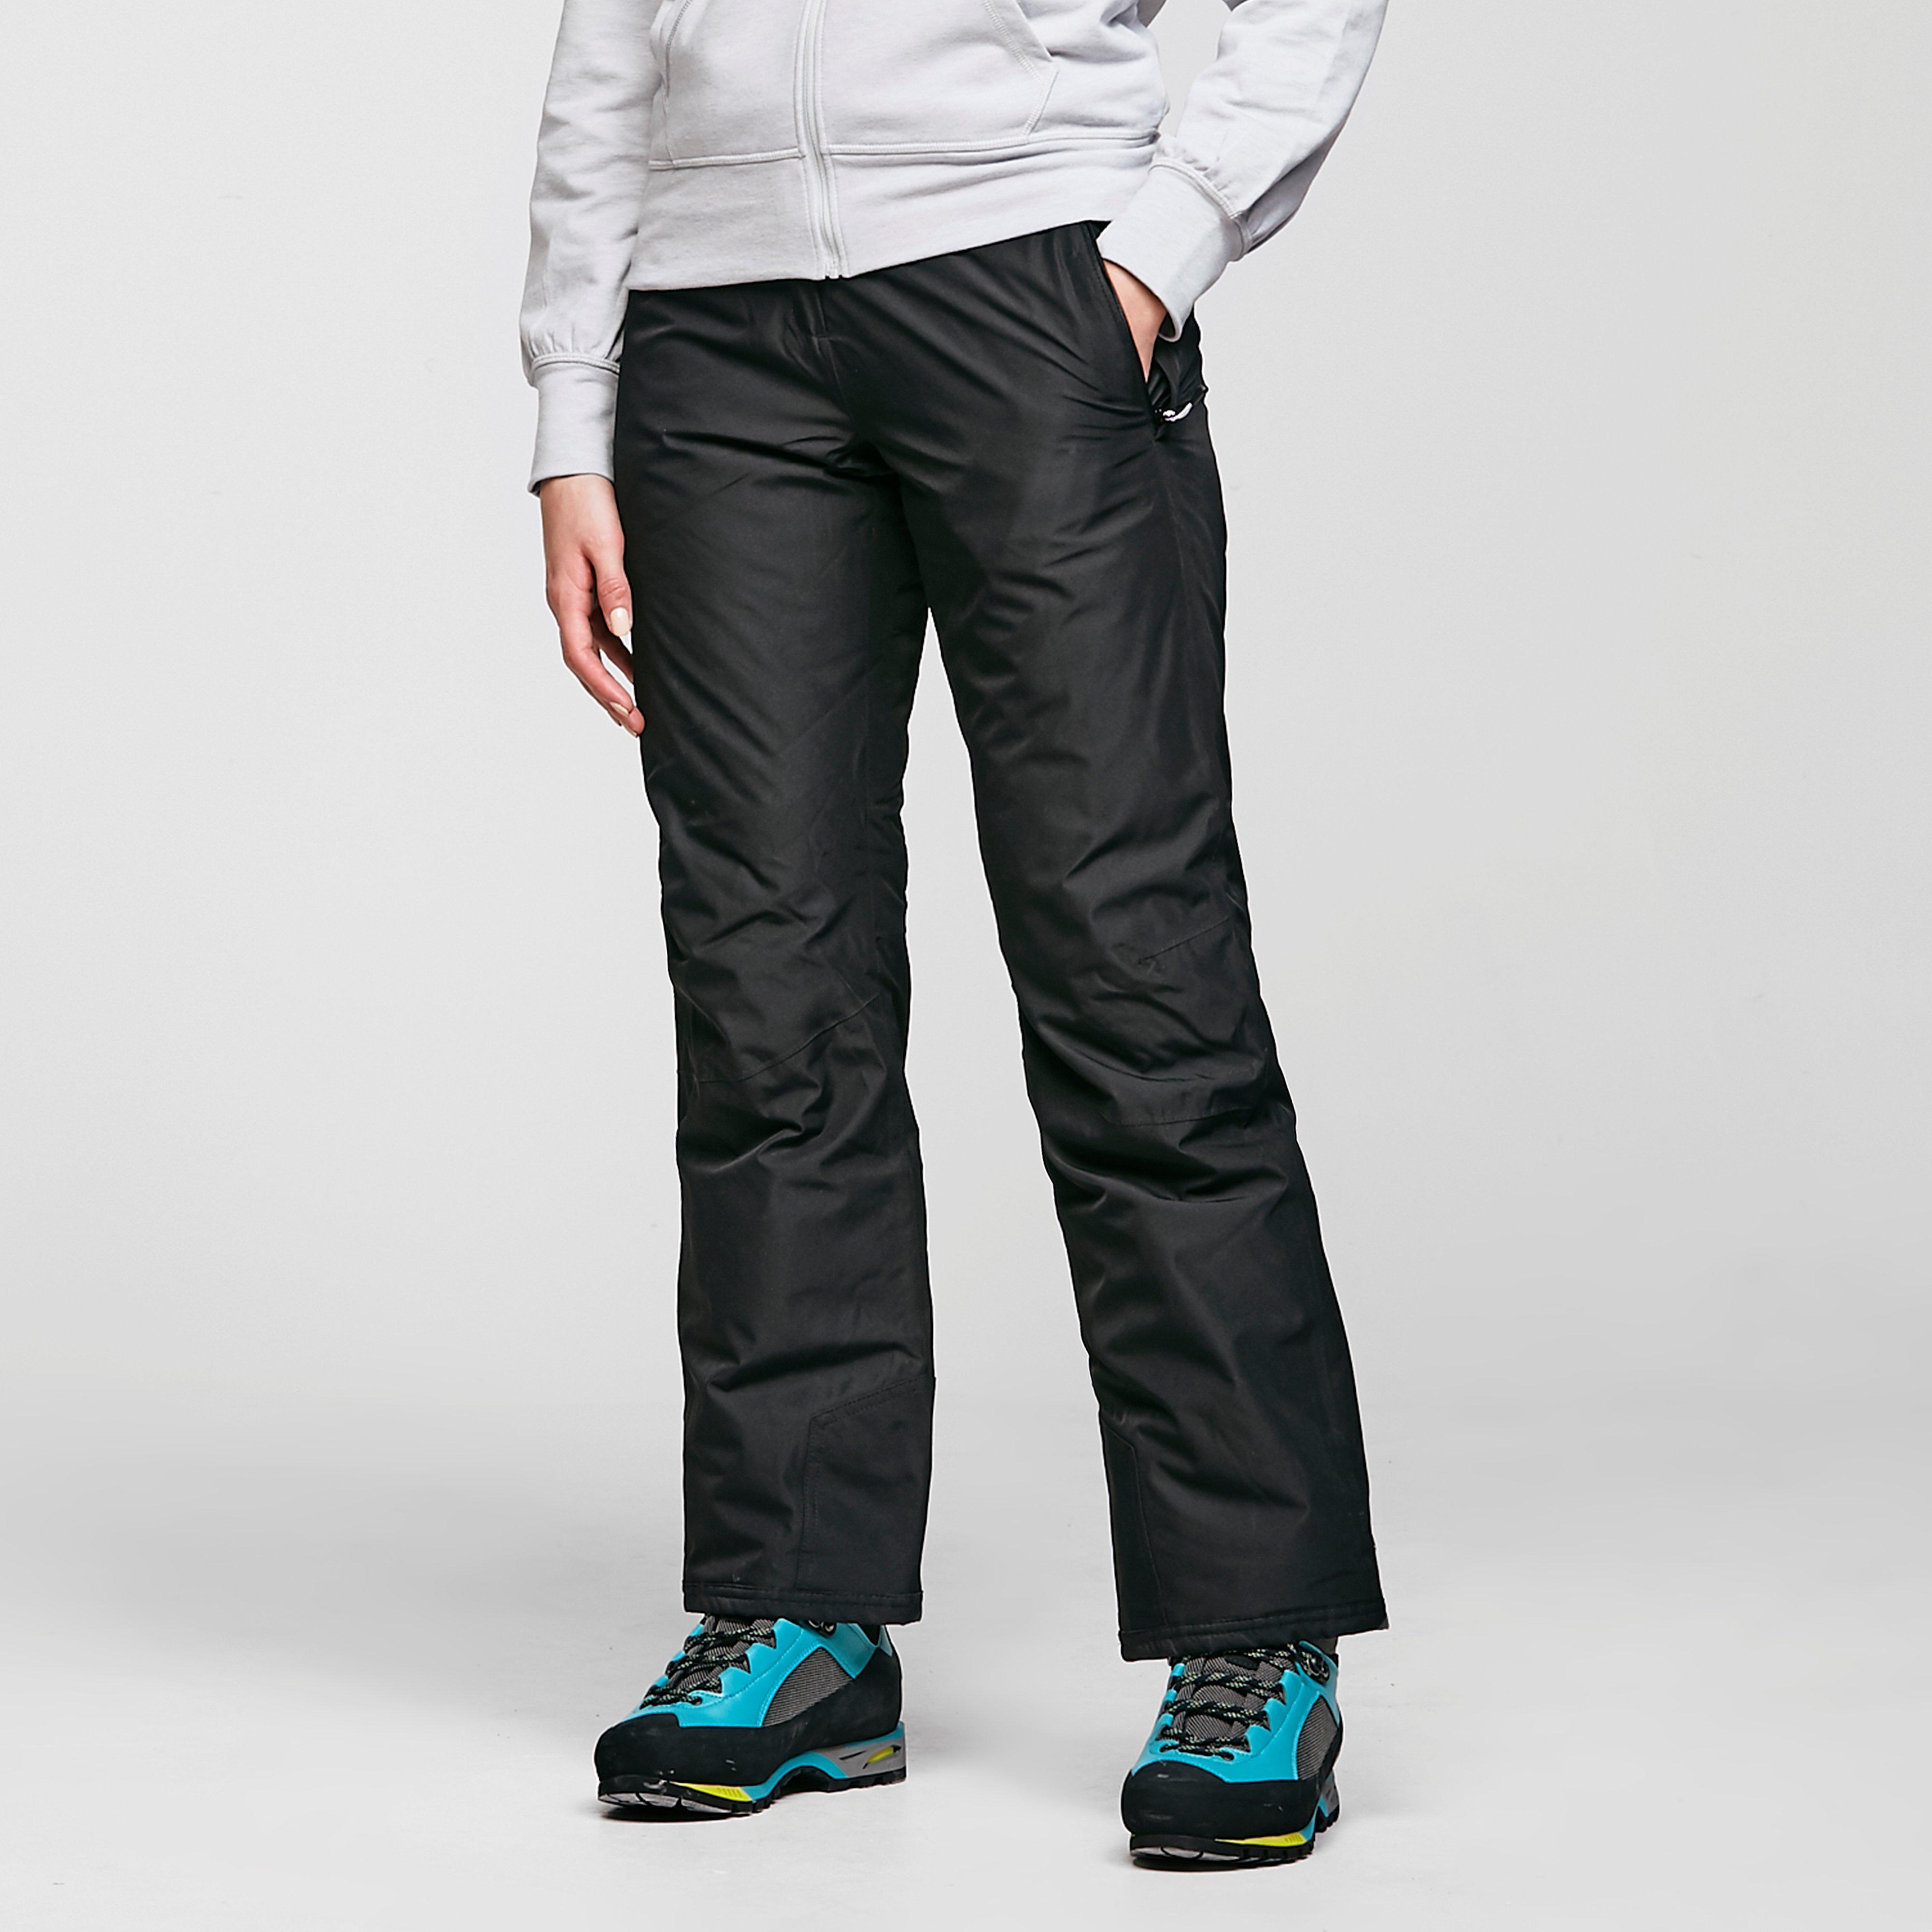 Dare 2b Dare 2B Womens Extort Ski Pants - Black, Black